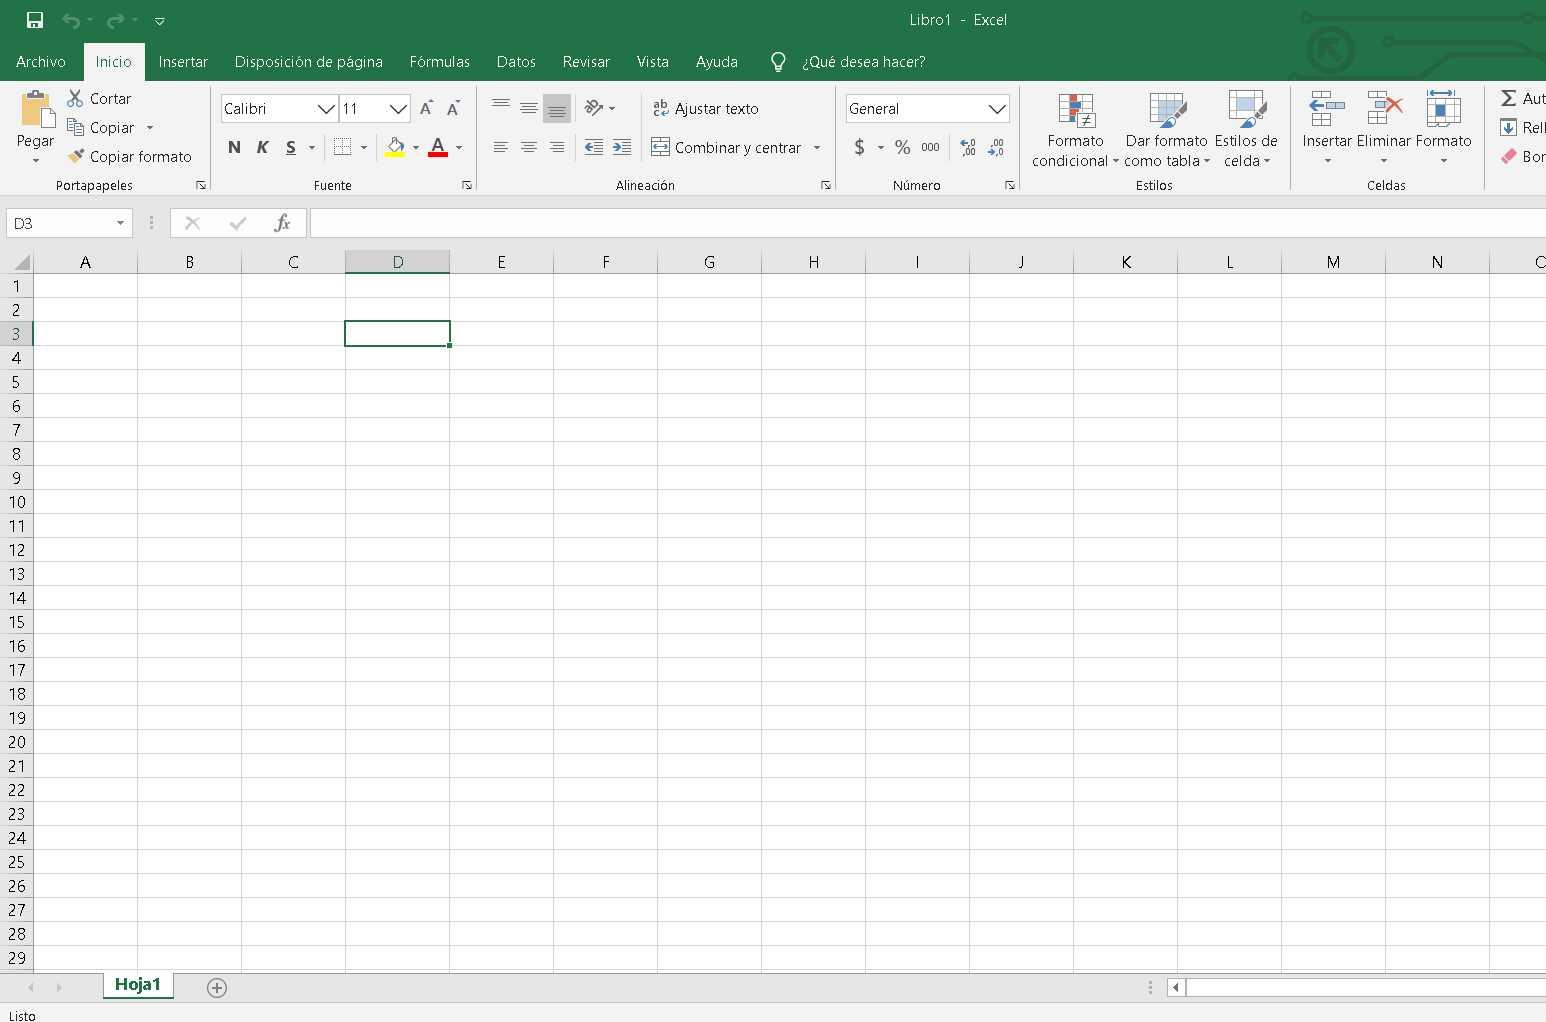 Microsoft Office Professional Plus Retail-VL 2019 Version 2004 Build 12730.20352